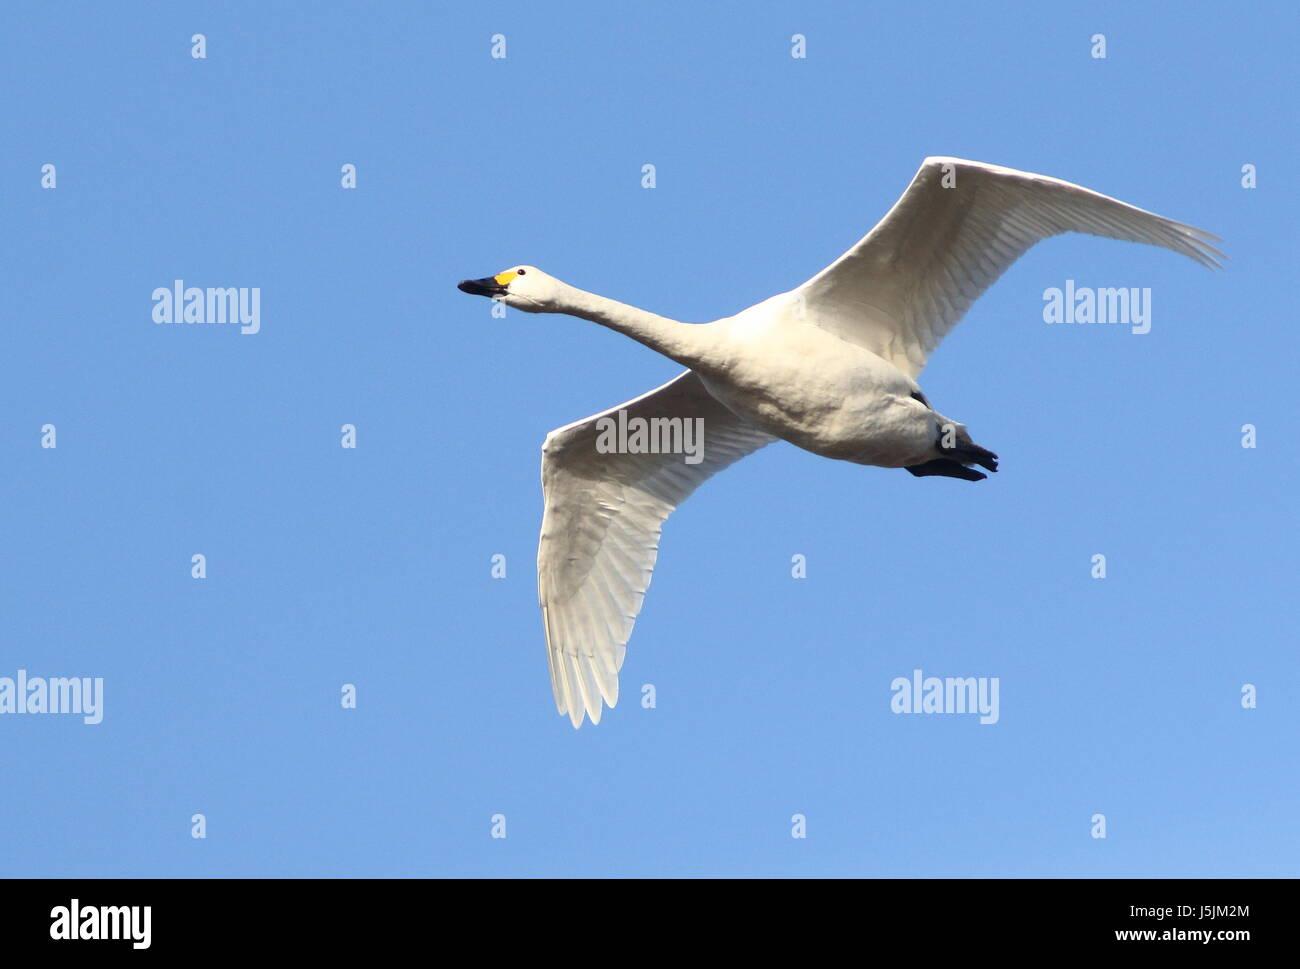 Eurasian Whooper Swan (Cygnus Cygnus) in fast flight against a blue sky. Stock Photo